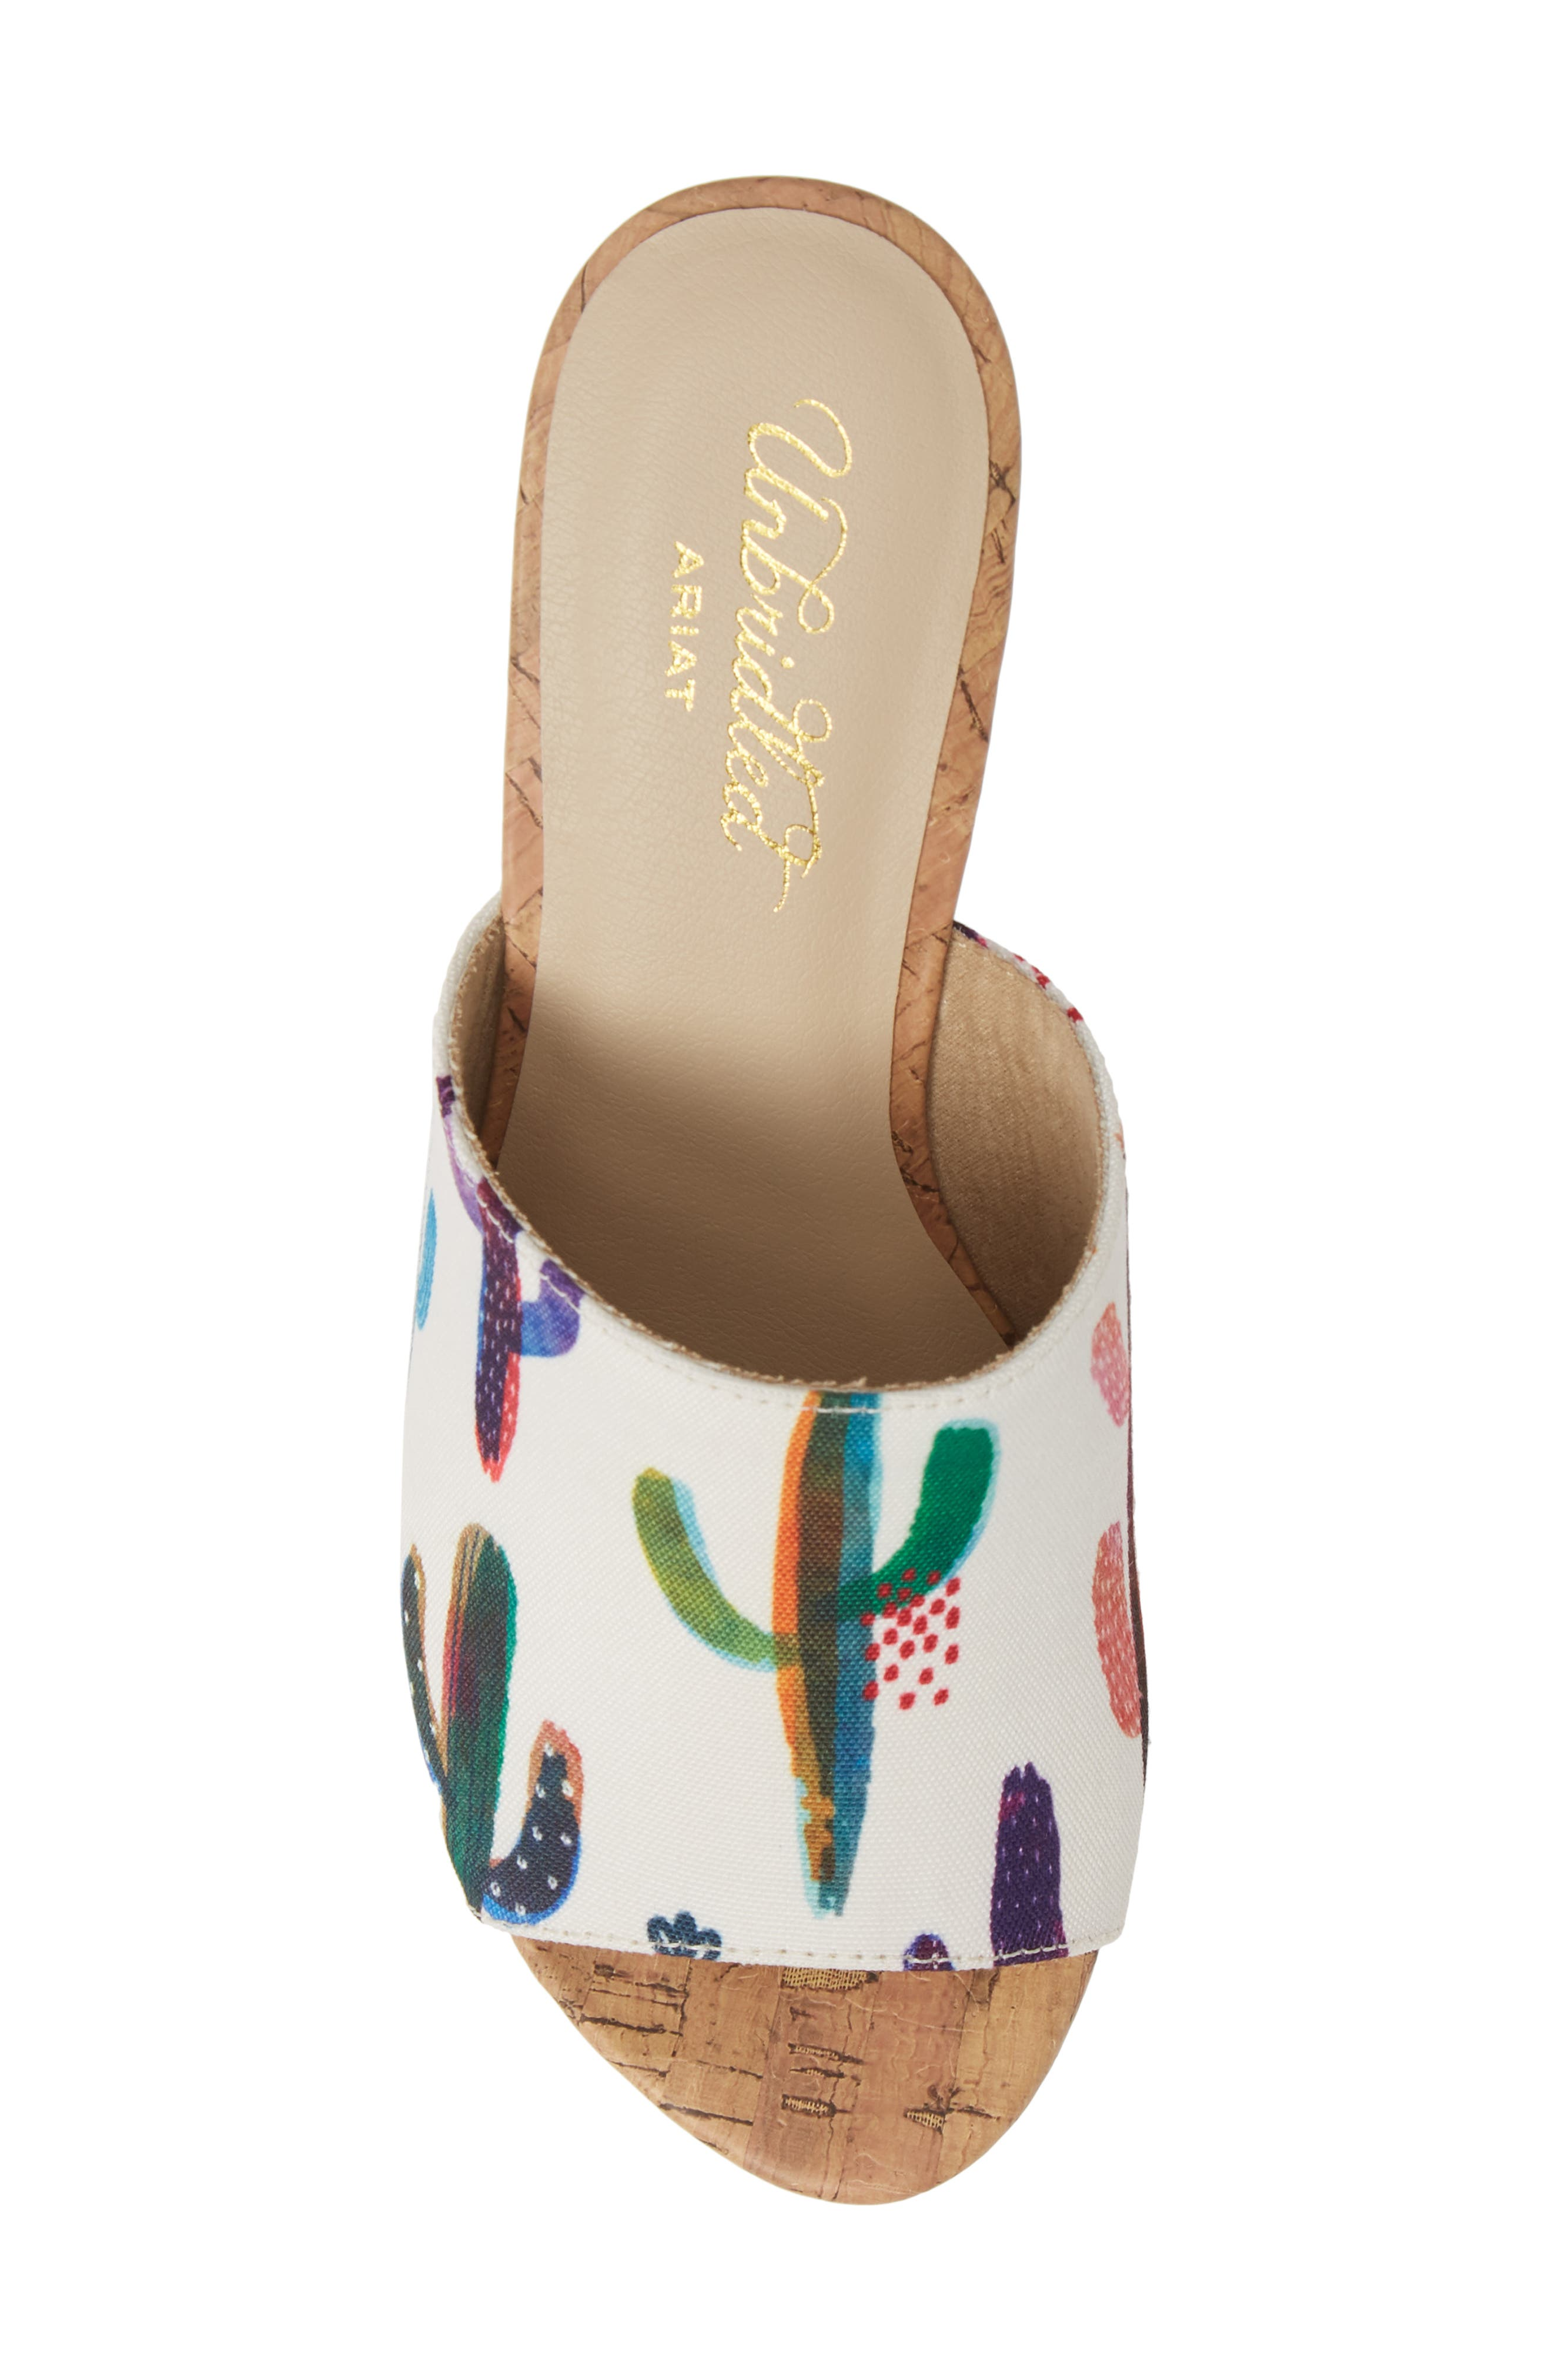 ARIAT, Layla Wedge Slide Sandal, Alternate thumbnail 5, color, CACTUS PRINT FABRIC